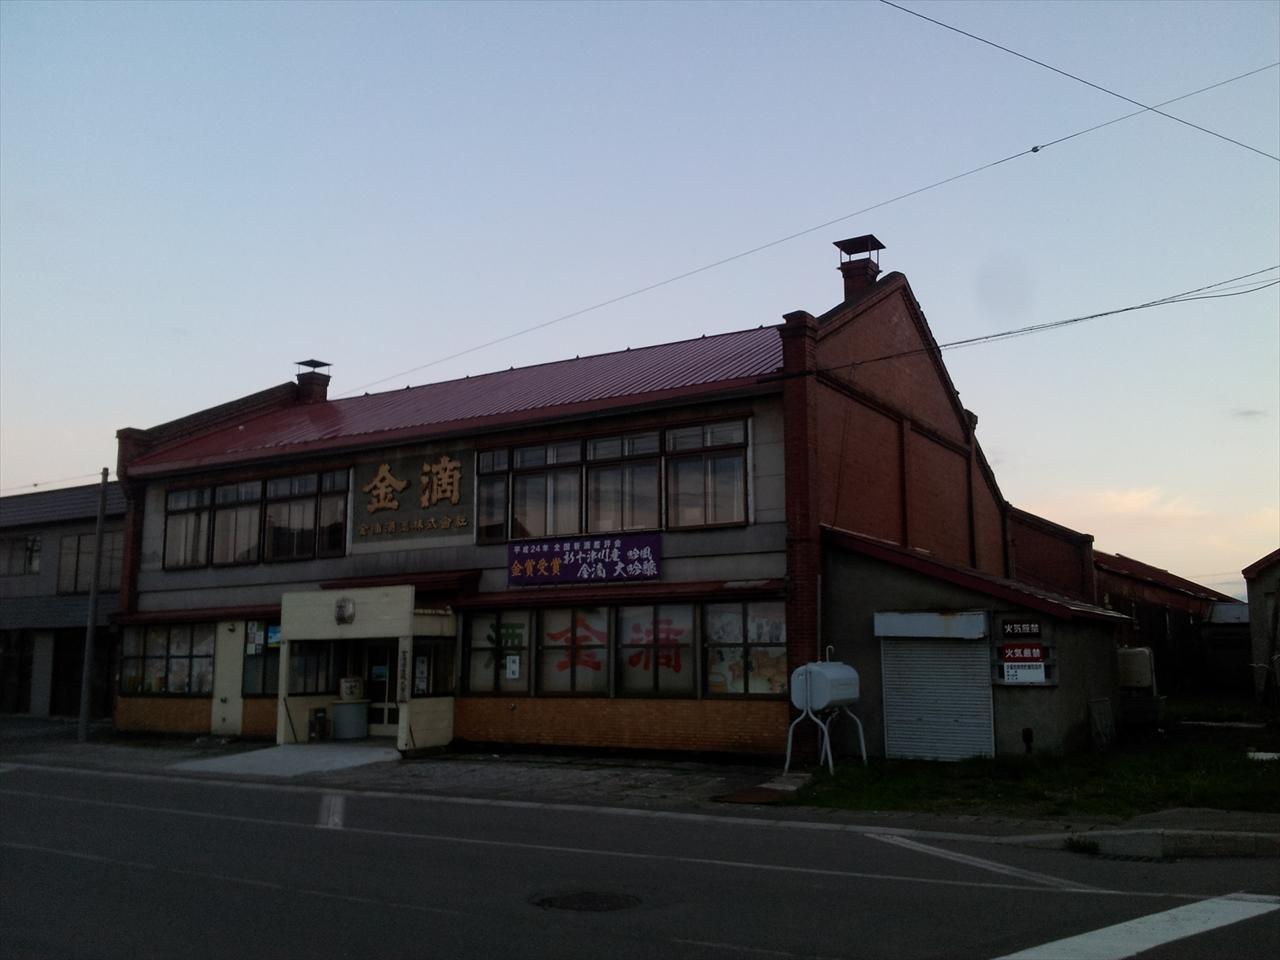 20130525_185945